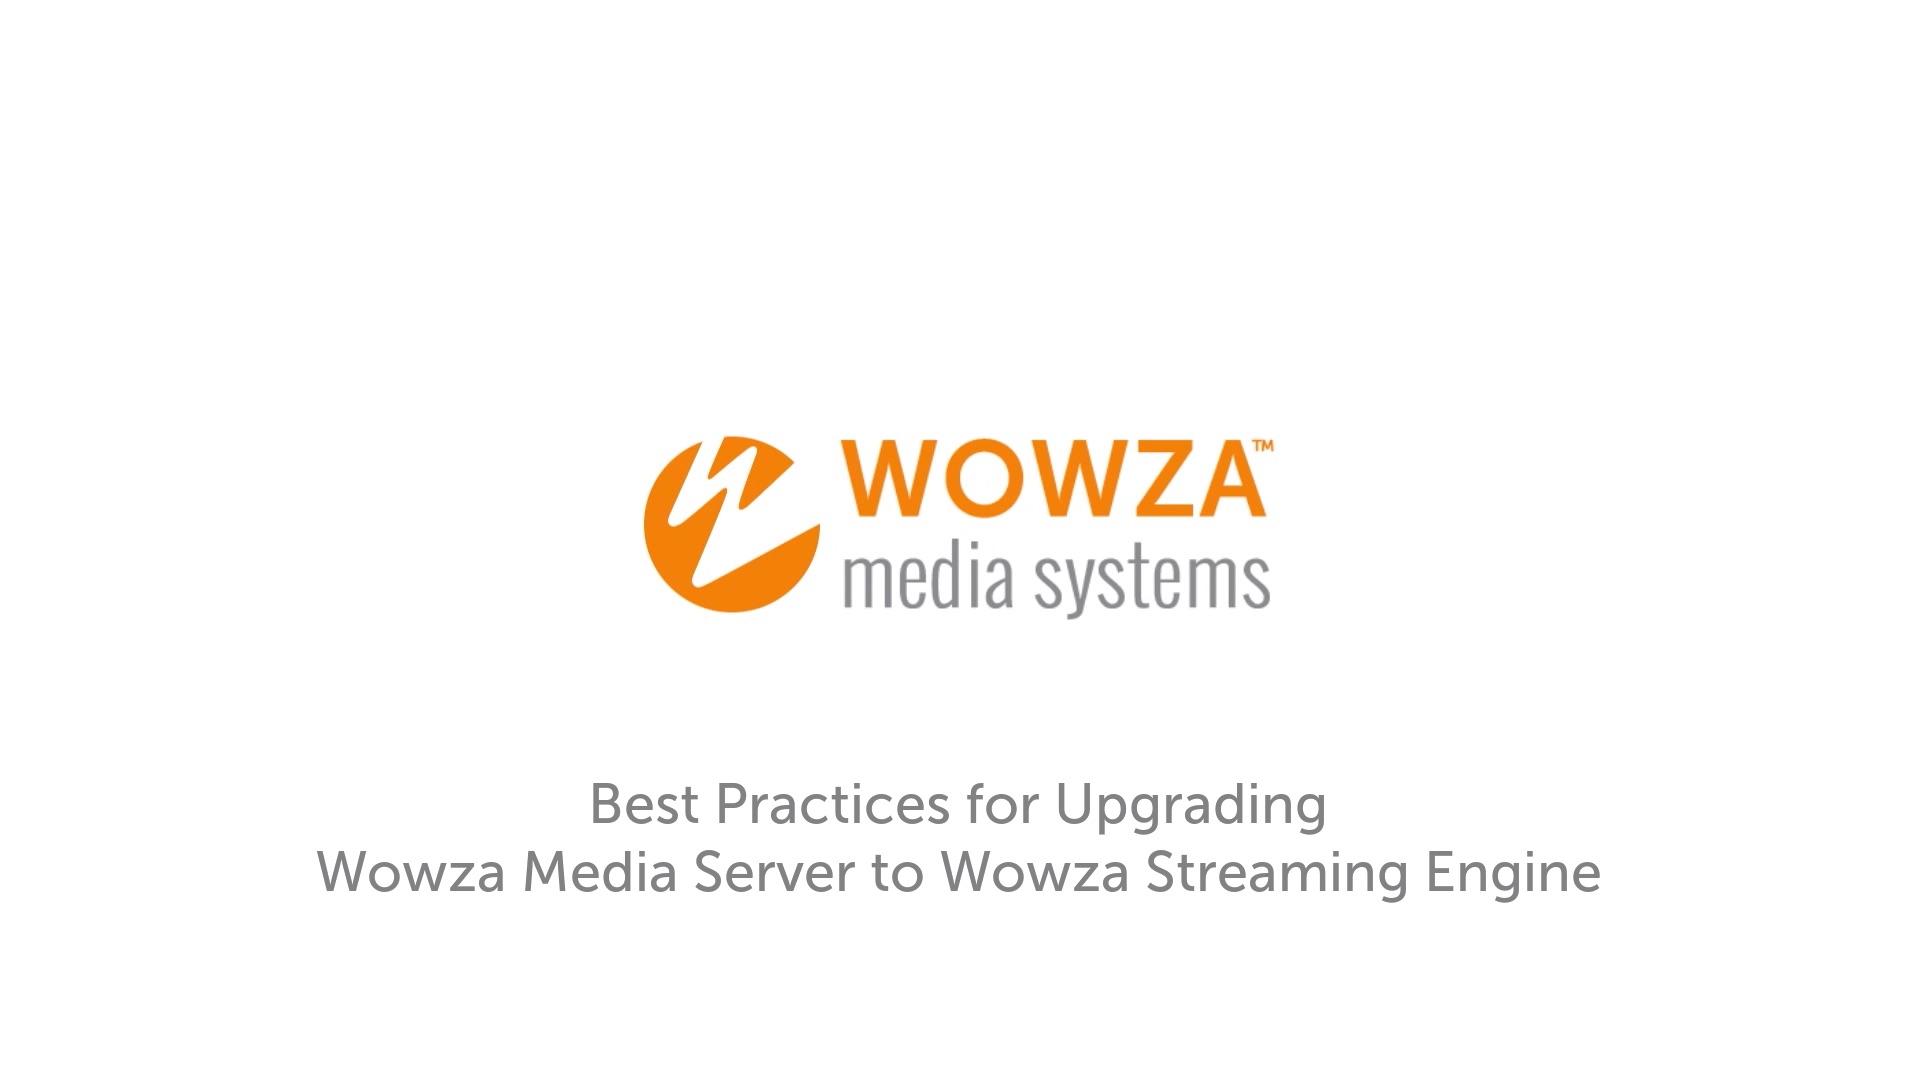 Upgrade Wowza Media Server to Wowza Streaming Engine